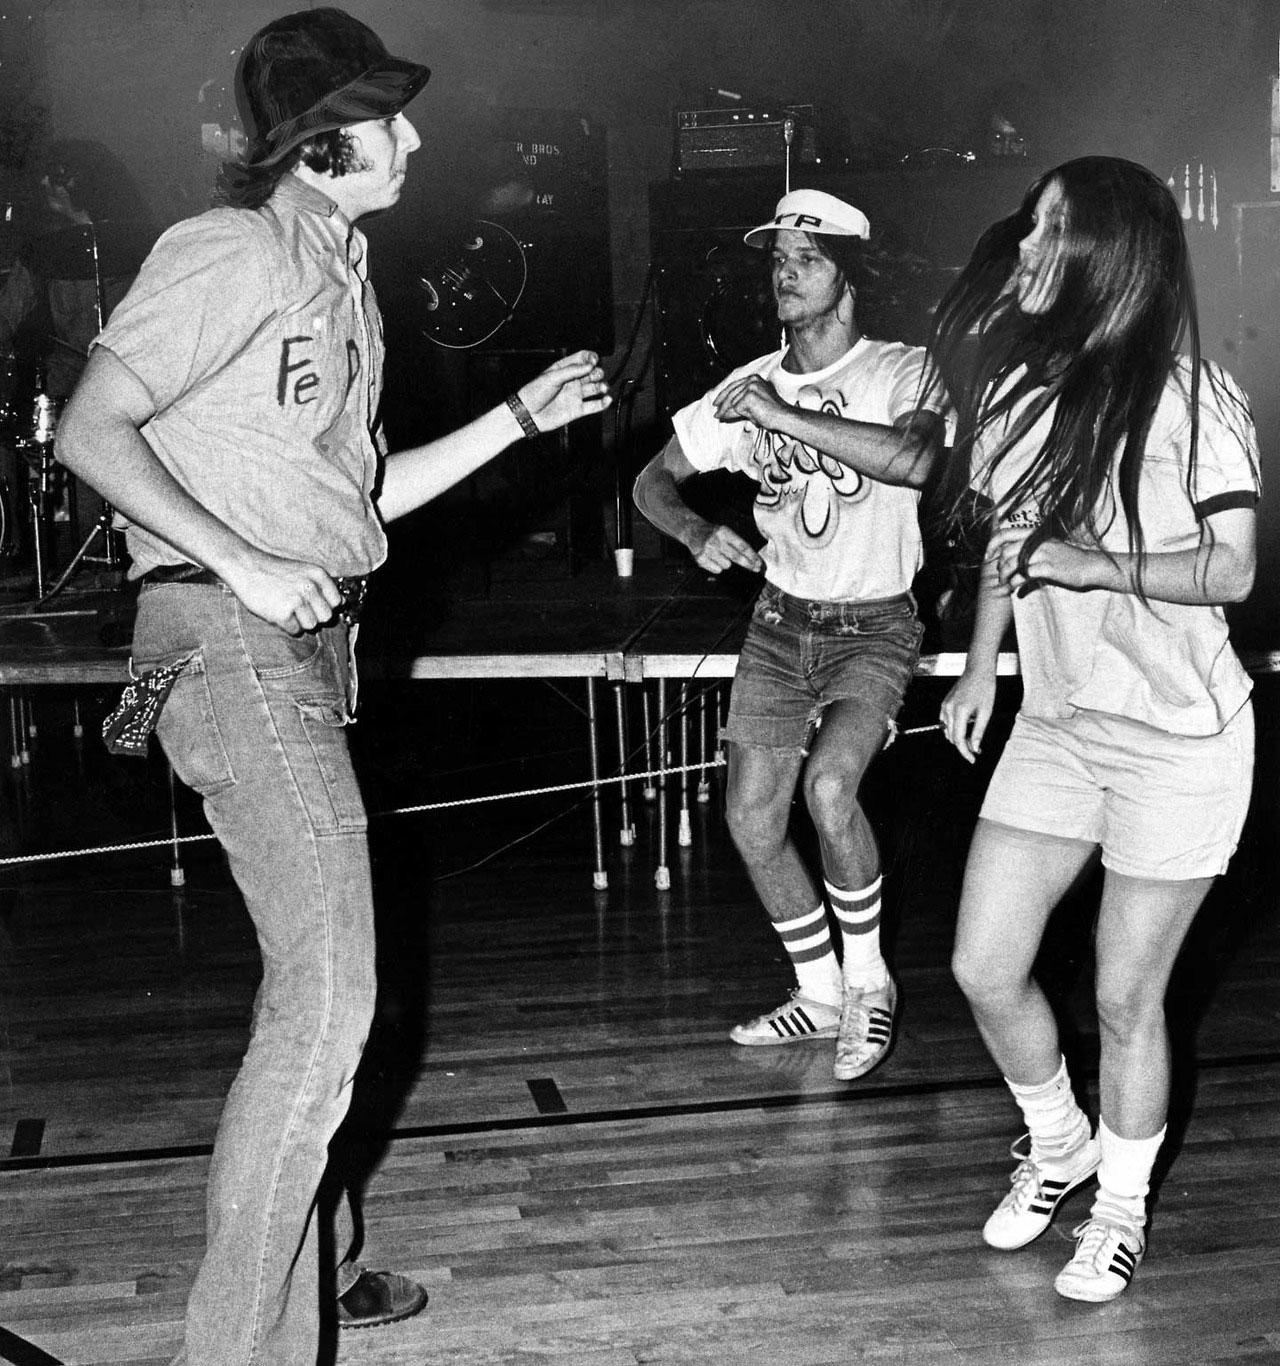 Dance marathon in Pittsburgy, 1973